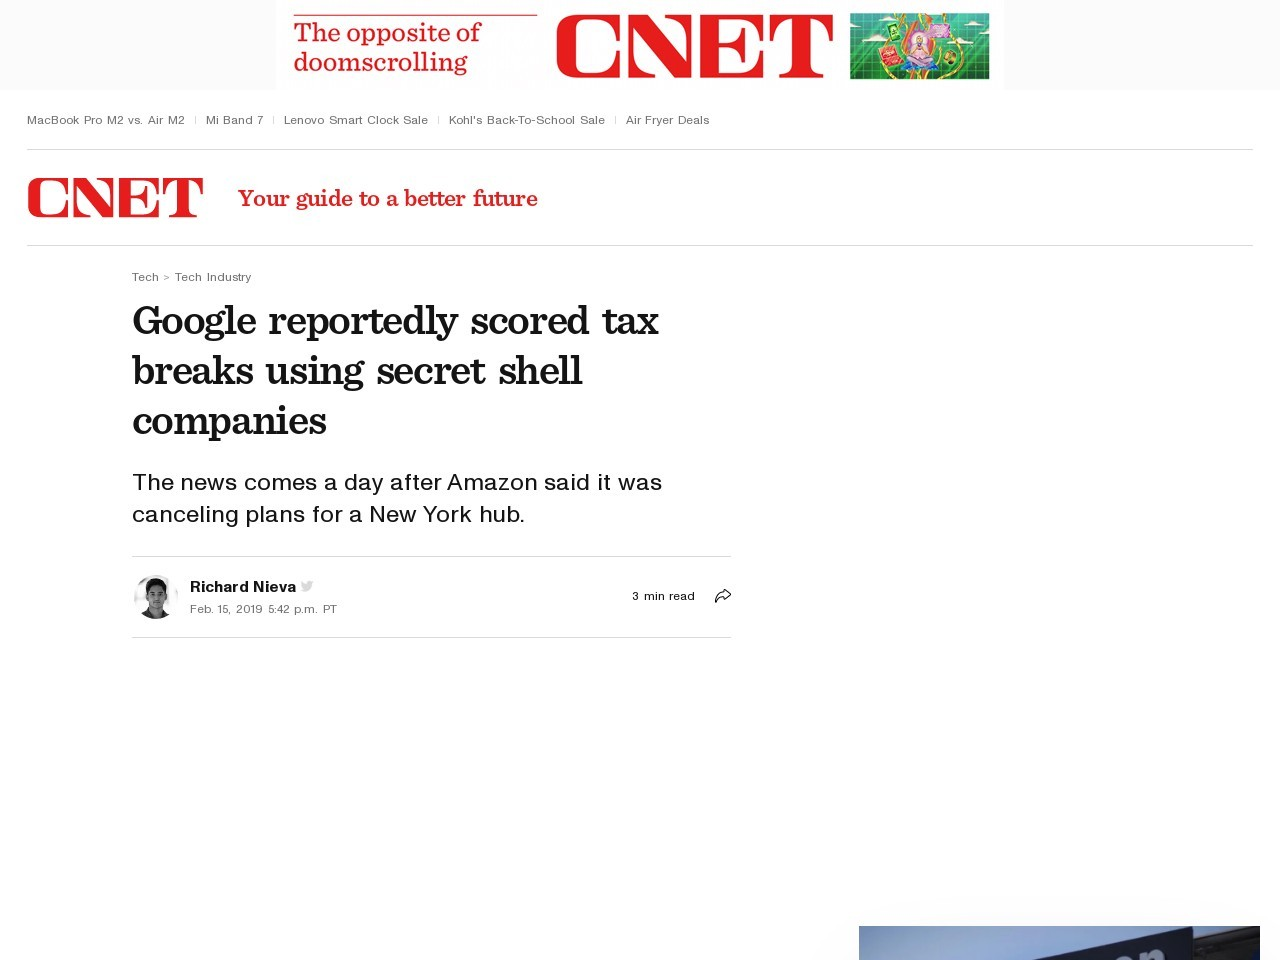 Google reportedly scored tax breaks using secret shell companies     – CNET